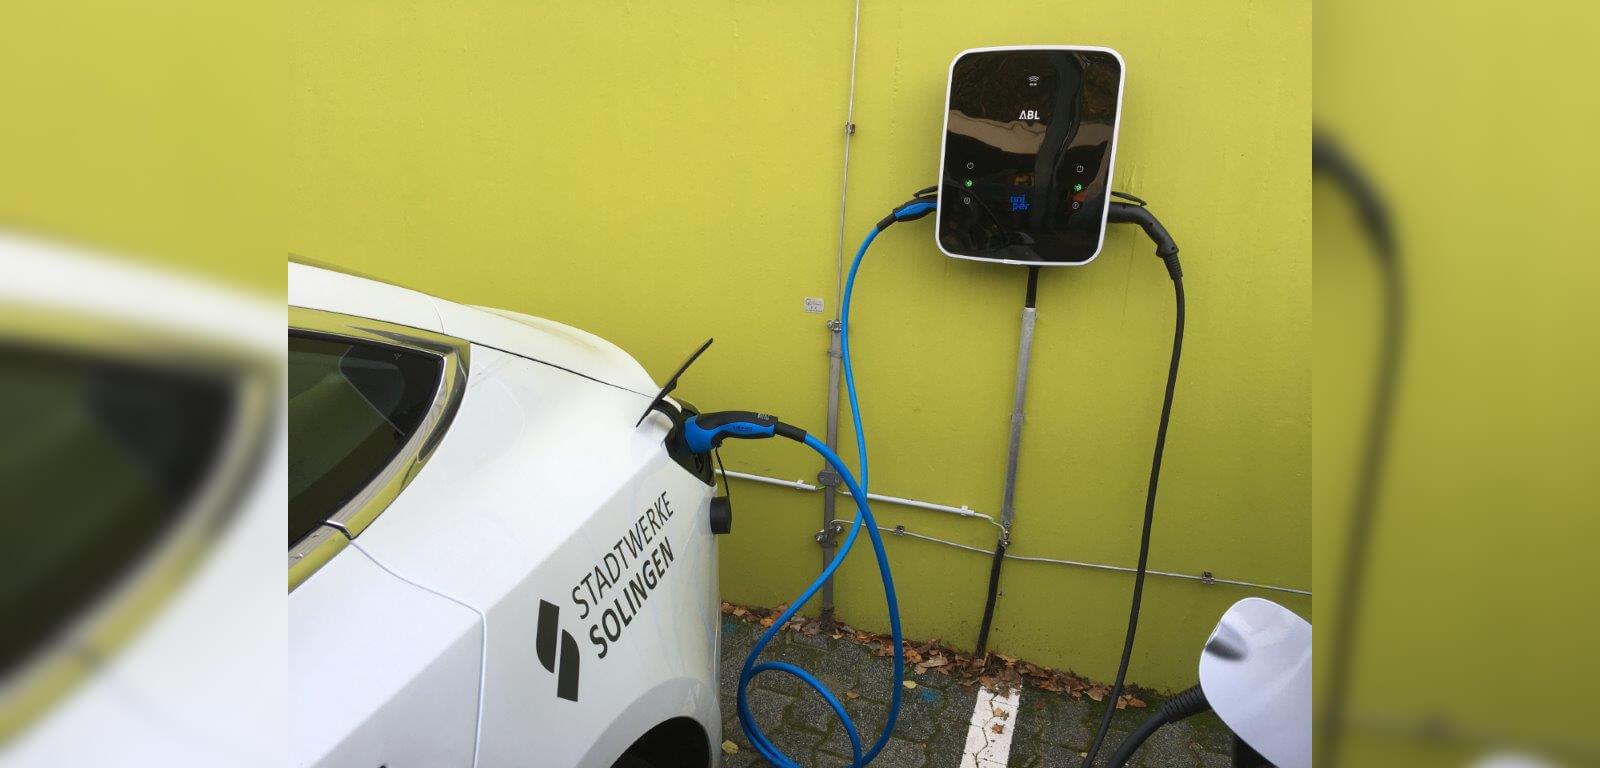 E-Auto an Wallbox Zuhause laden